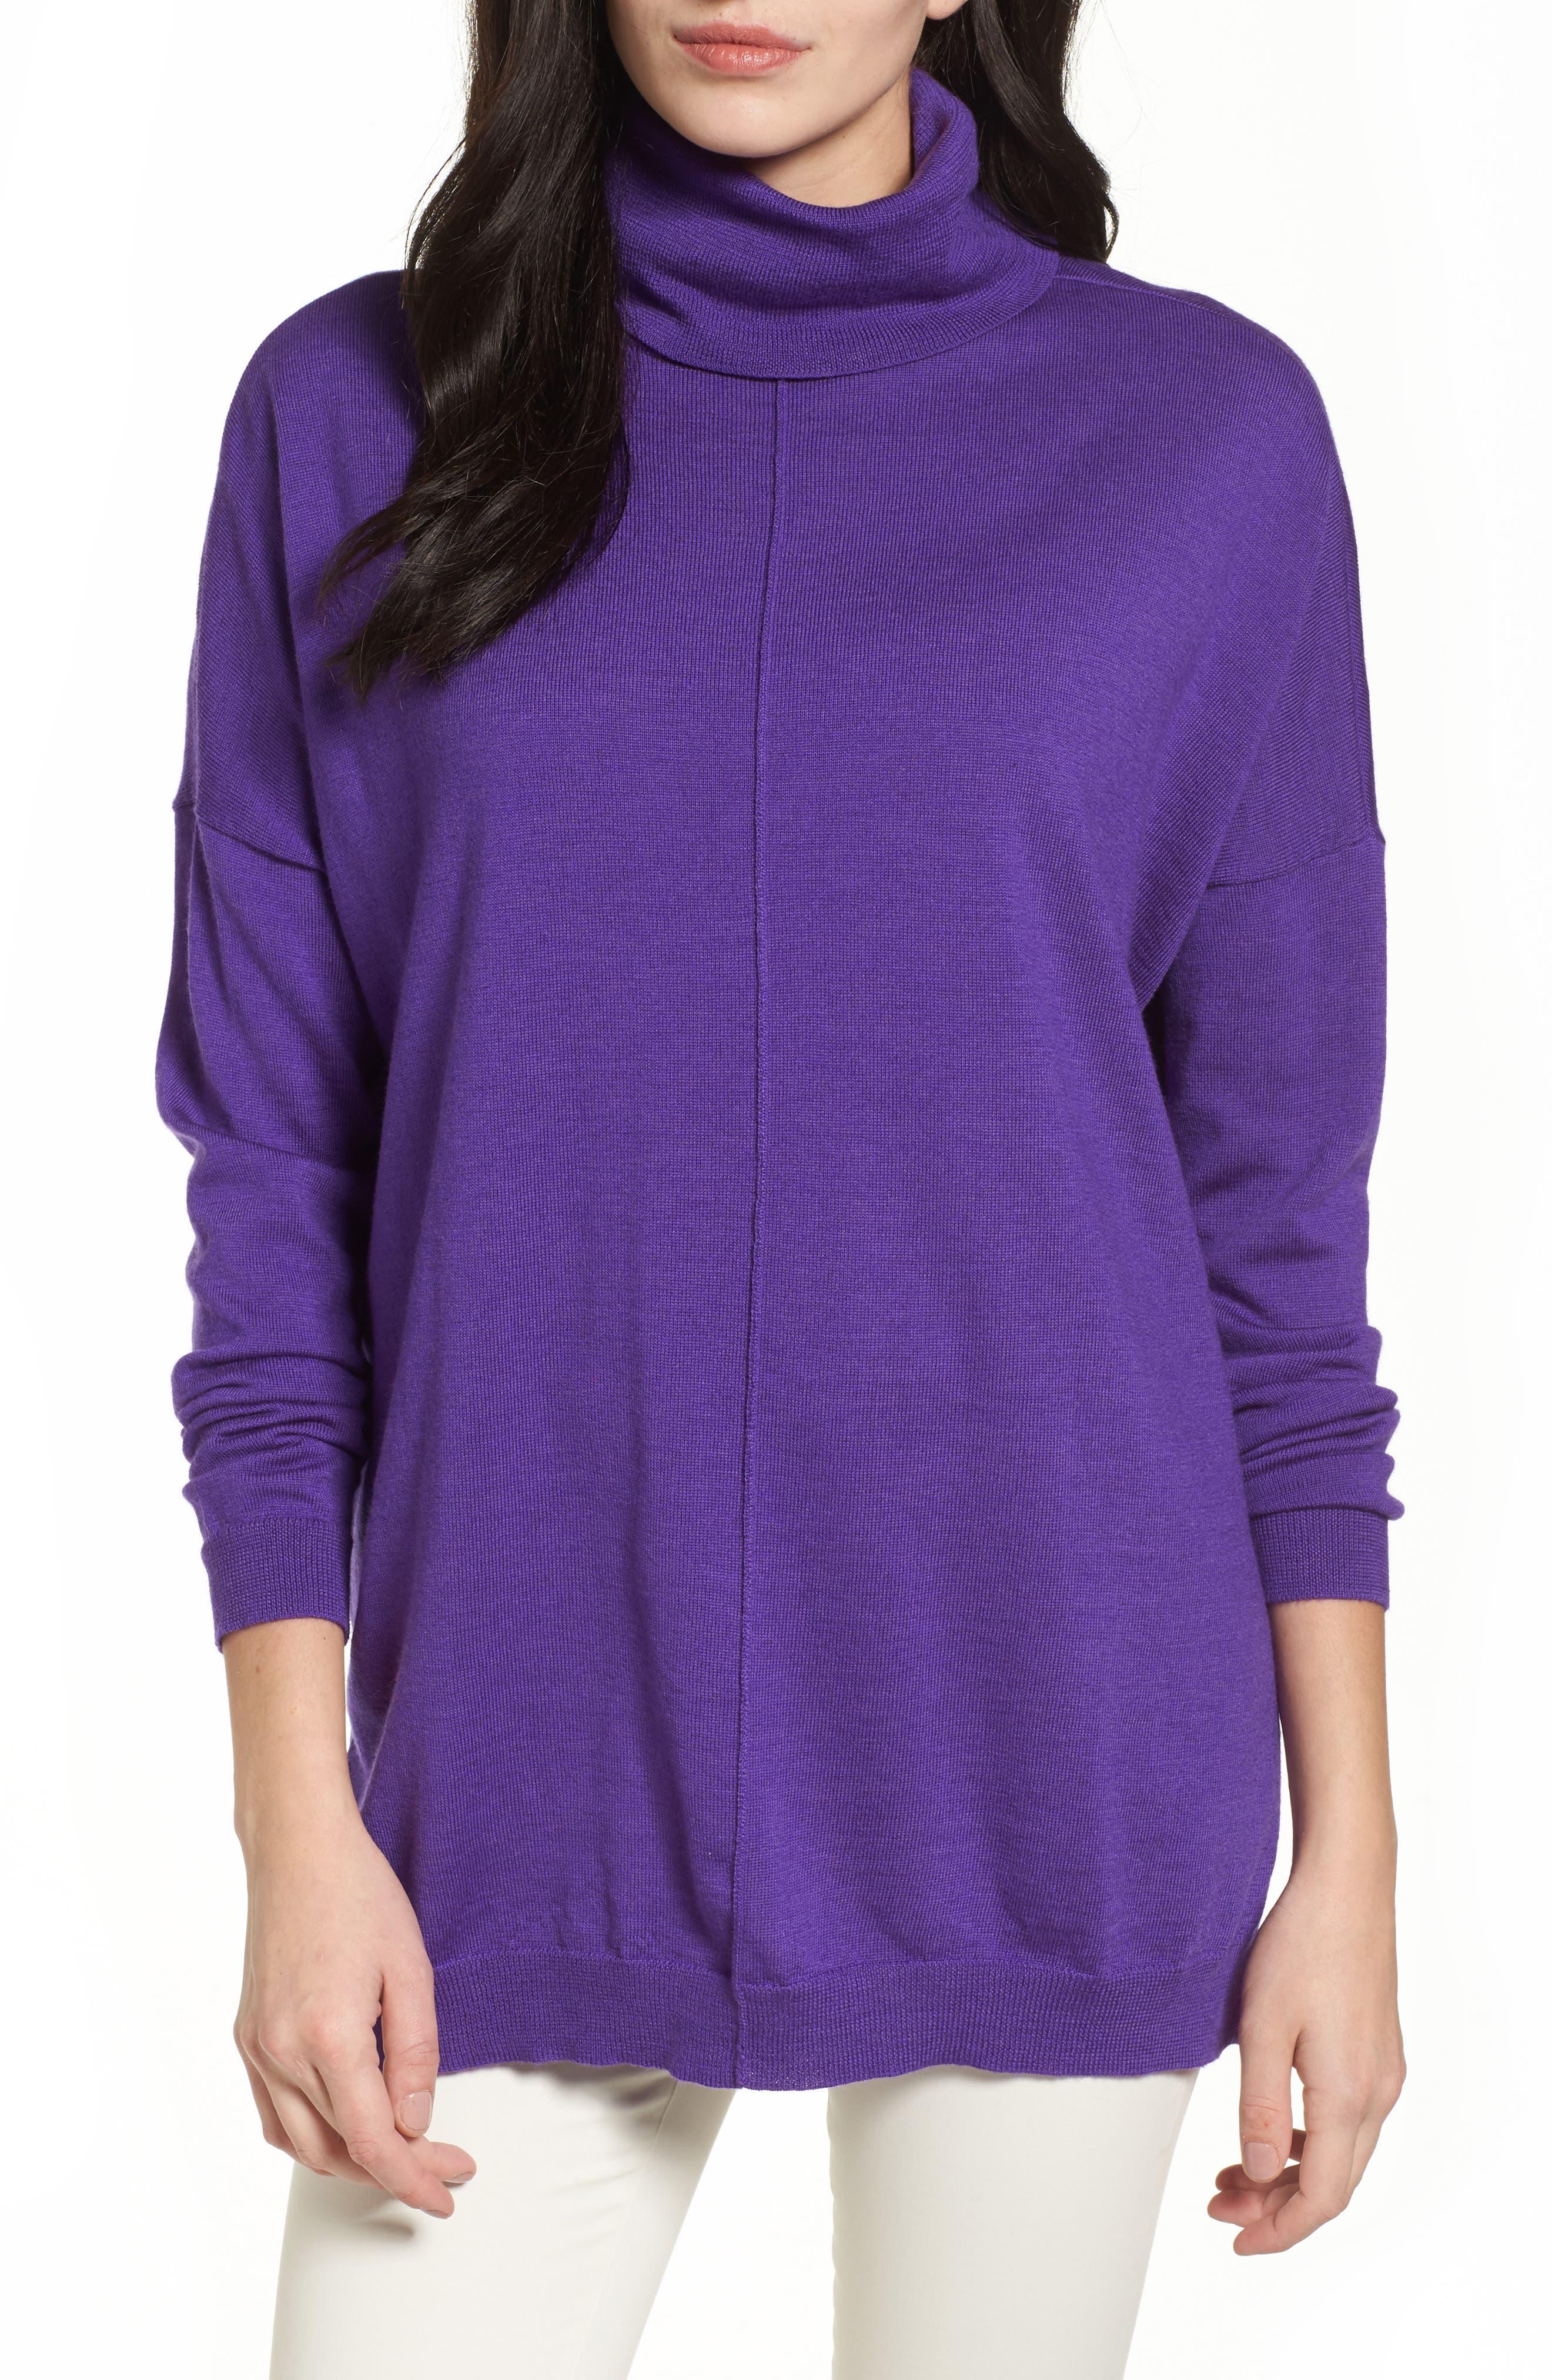 Eileen Fisher Merino Wool Boxy Turtleneck Sweater (Regular & Petite)